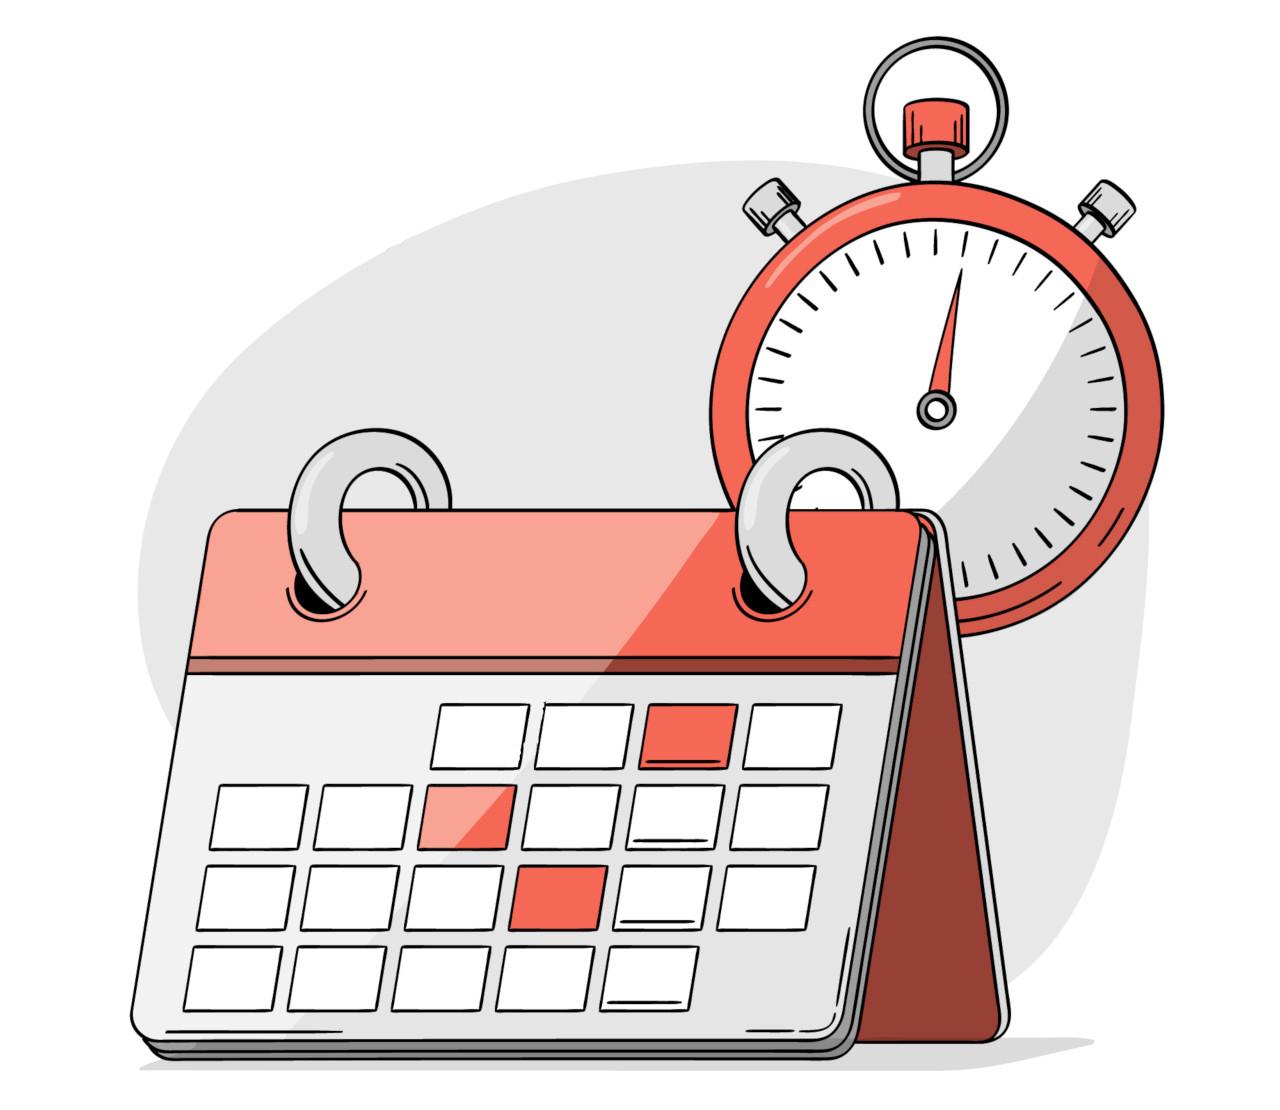 Weekly earning plan on Raceoption platform